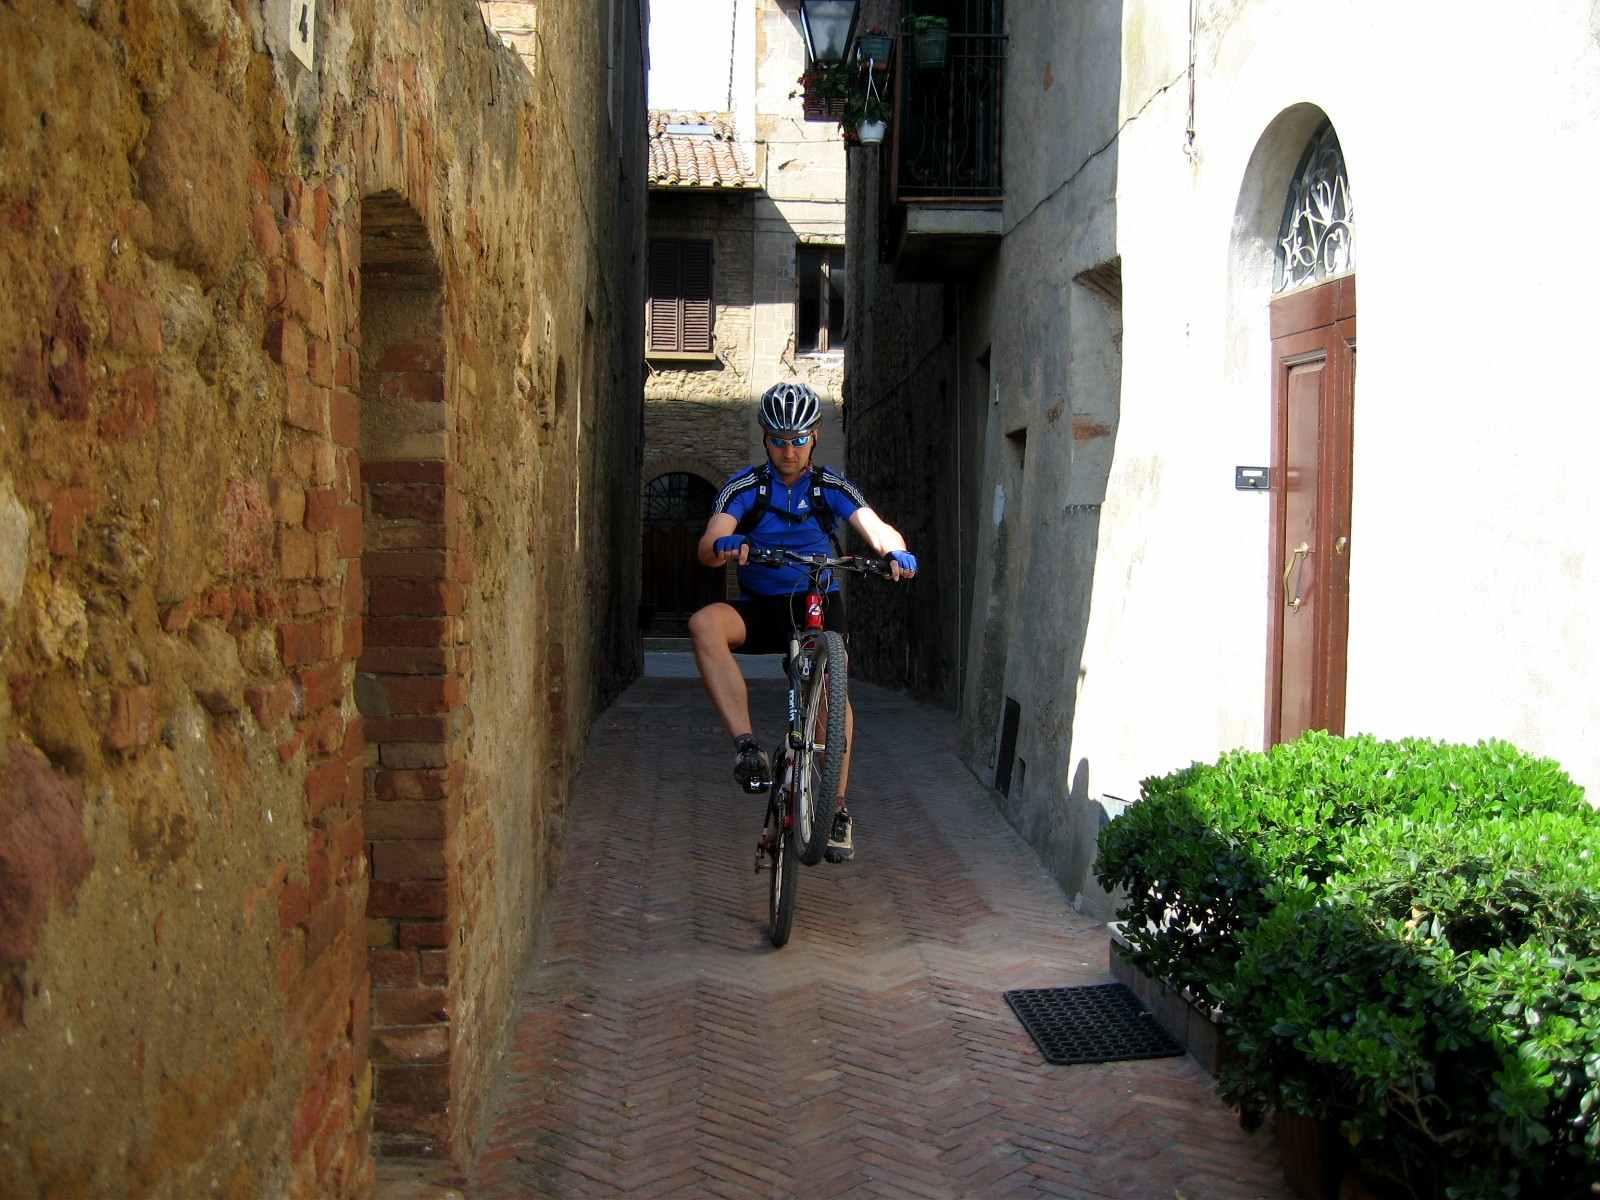 Foto: Manfred Karl / Mountainbike Tour / Von Bagno Vignoni nach Pienza / Pienza / 20.06.2007 17:46:49